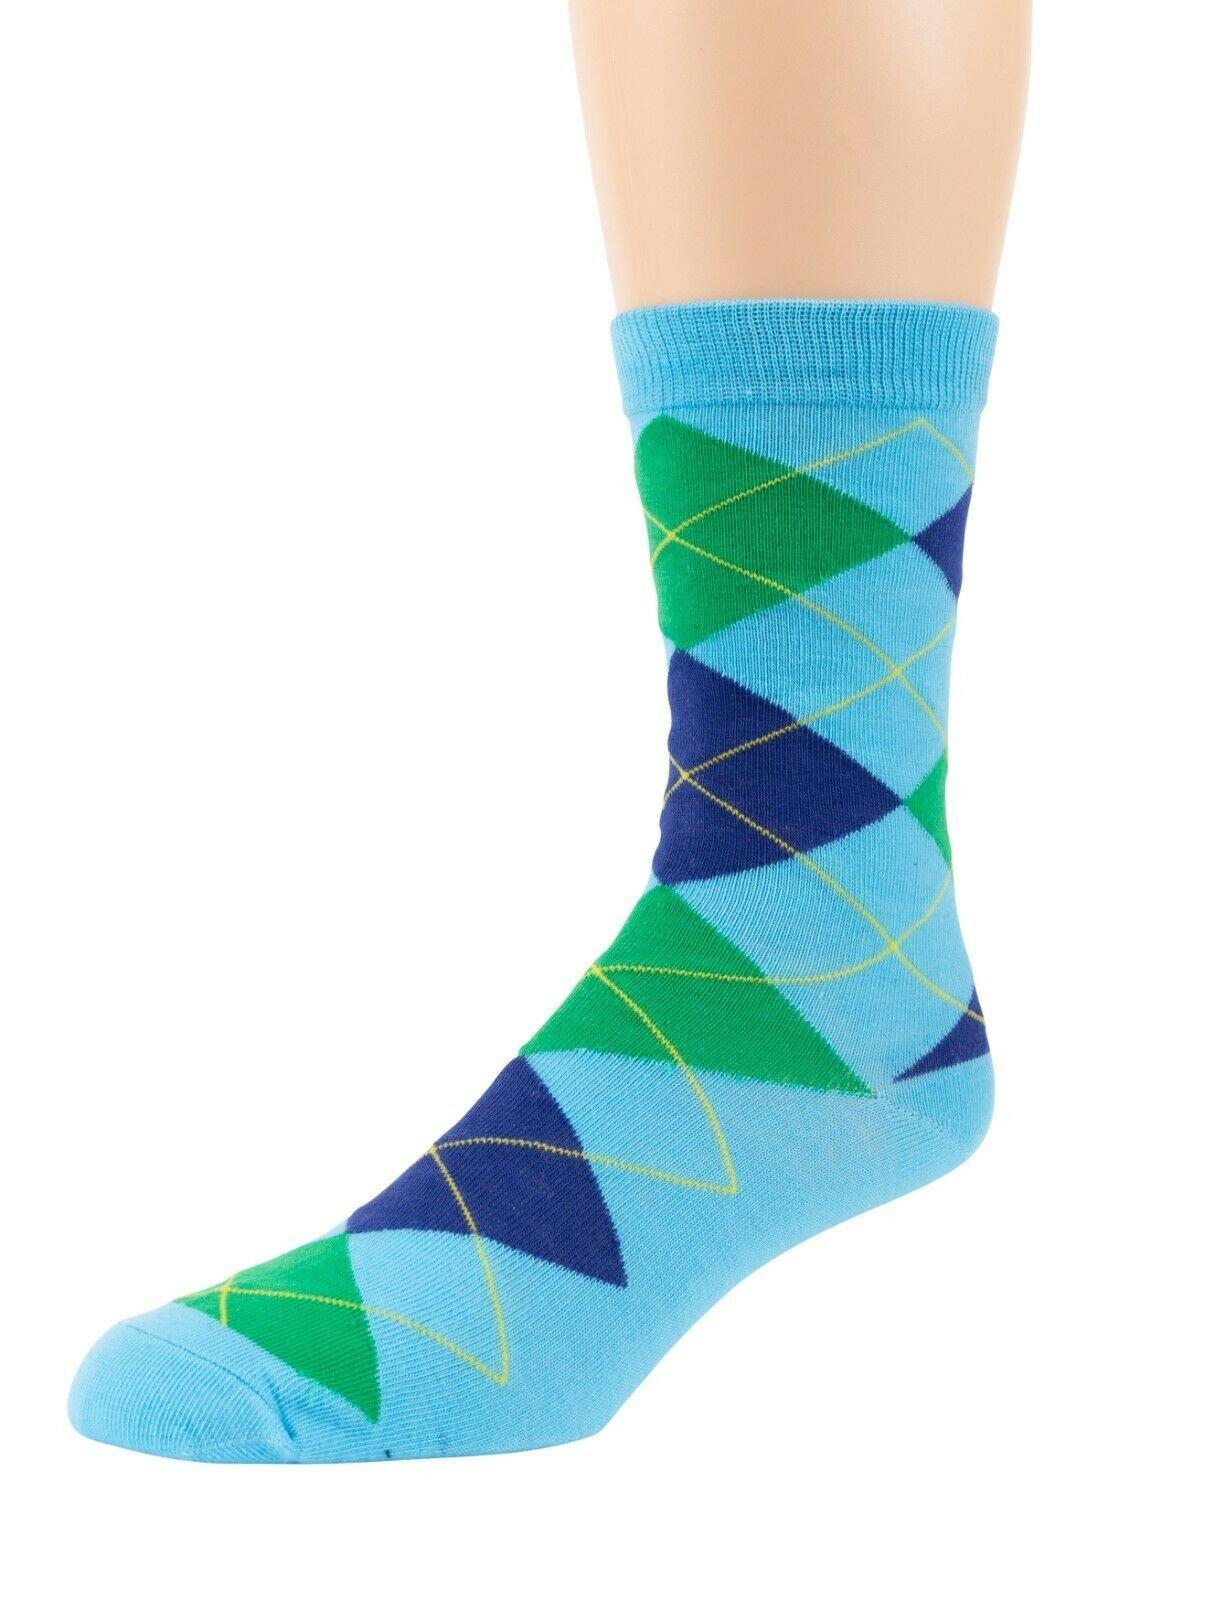 Mitch-Bogen-Mens-Cotton-Dress-Socks-Colorful-Fashion-Crew-Socks-8-Pack-Gift-Box thumbnail 44